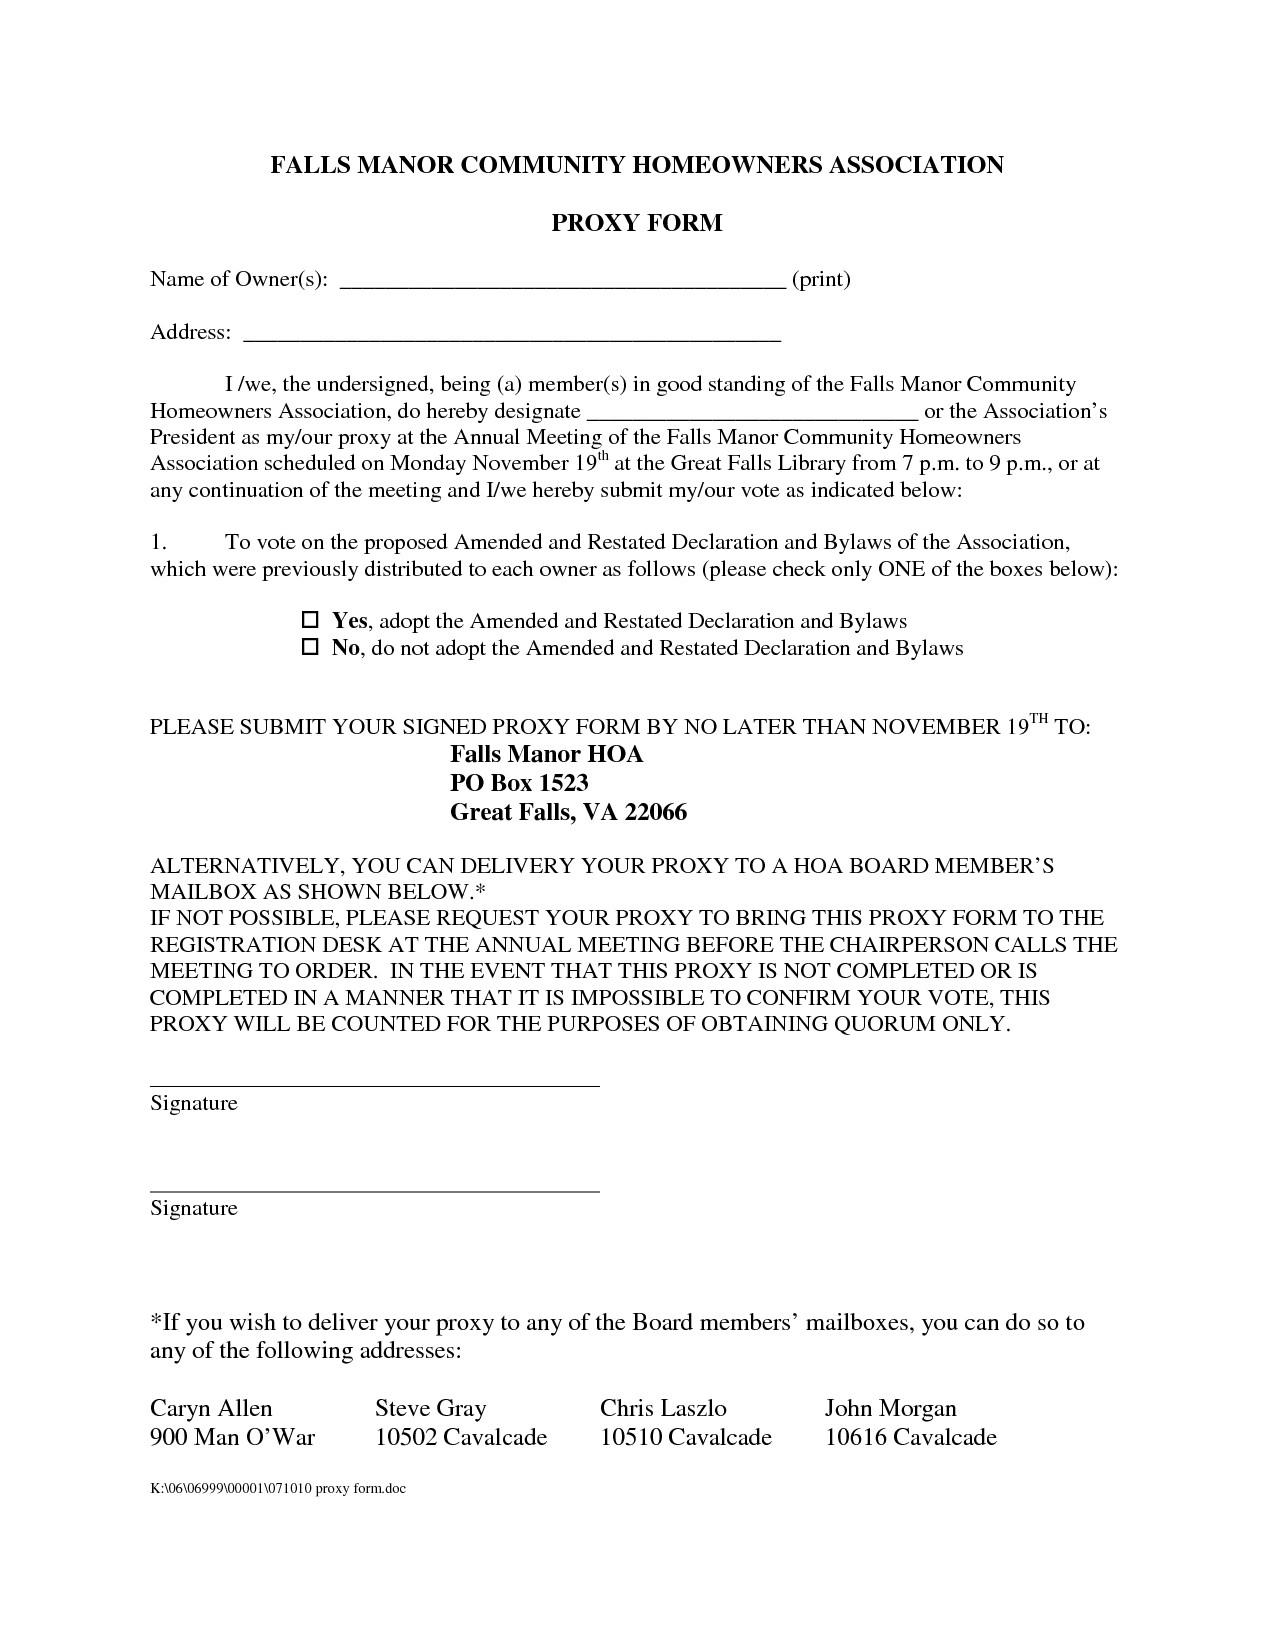 Hoa Proxy Vote form Template Dodoisthere — Proxy Vote In Australia Hoa Proxy form